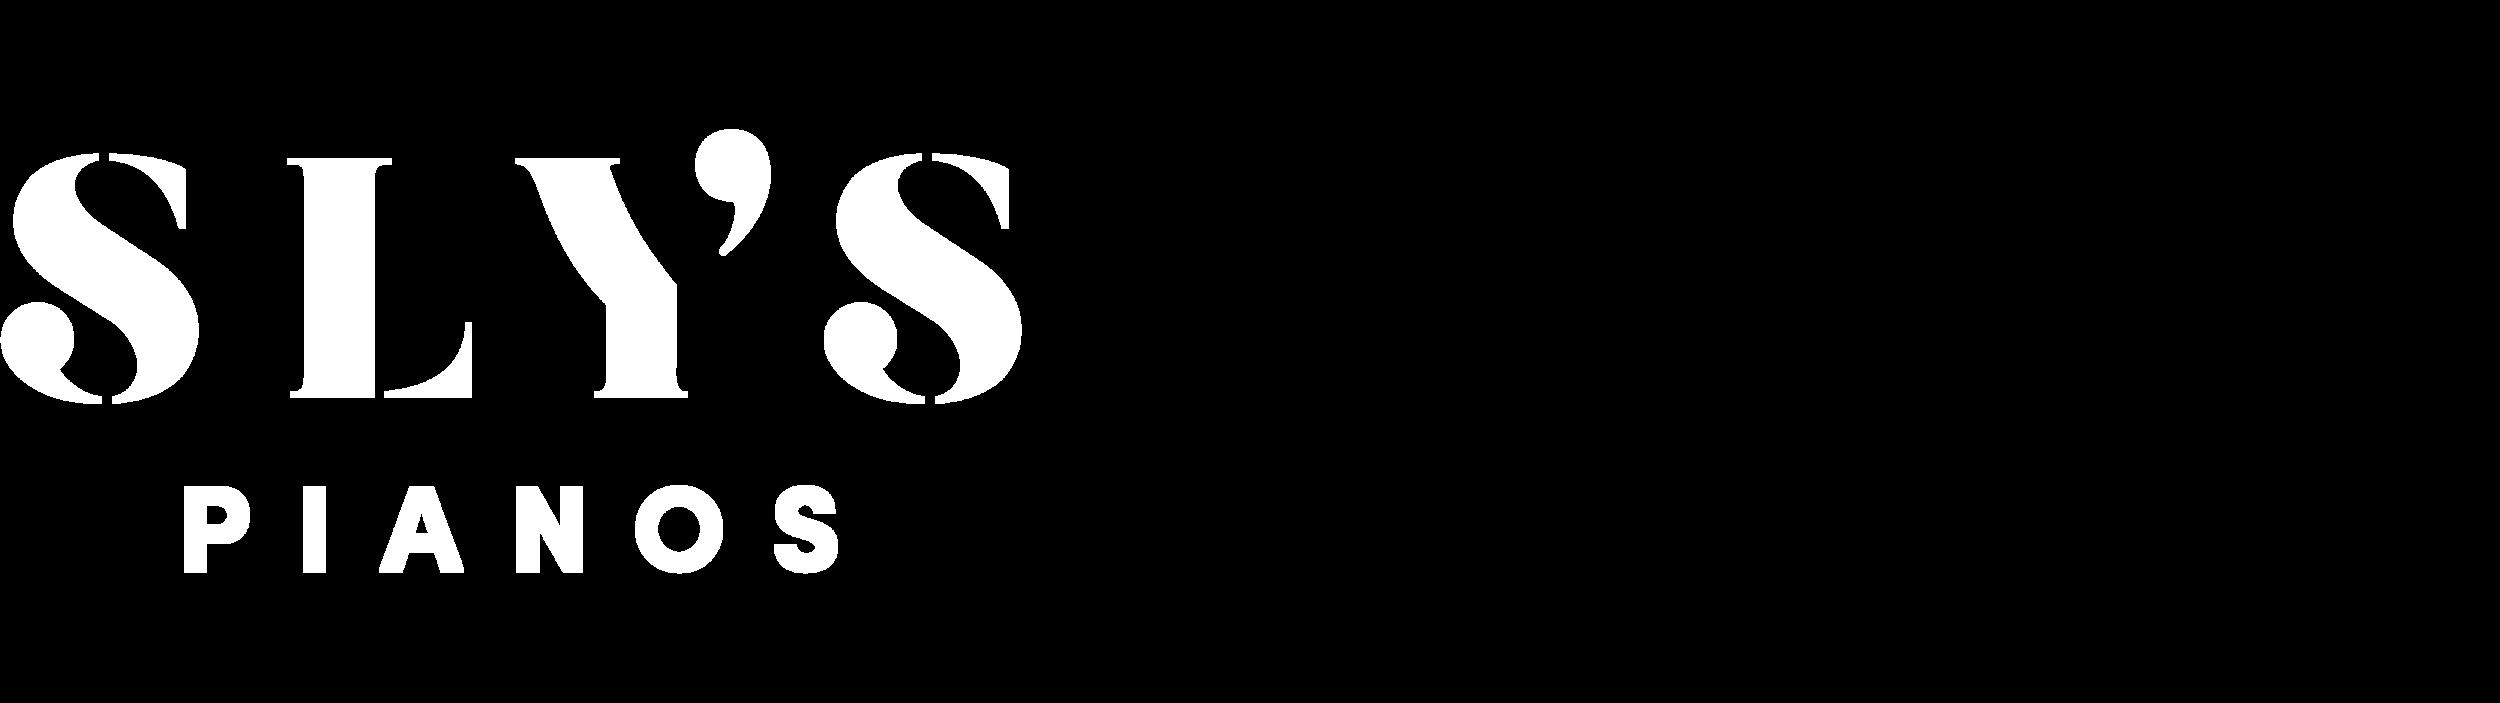 slys pianos logo.png